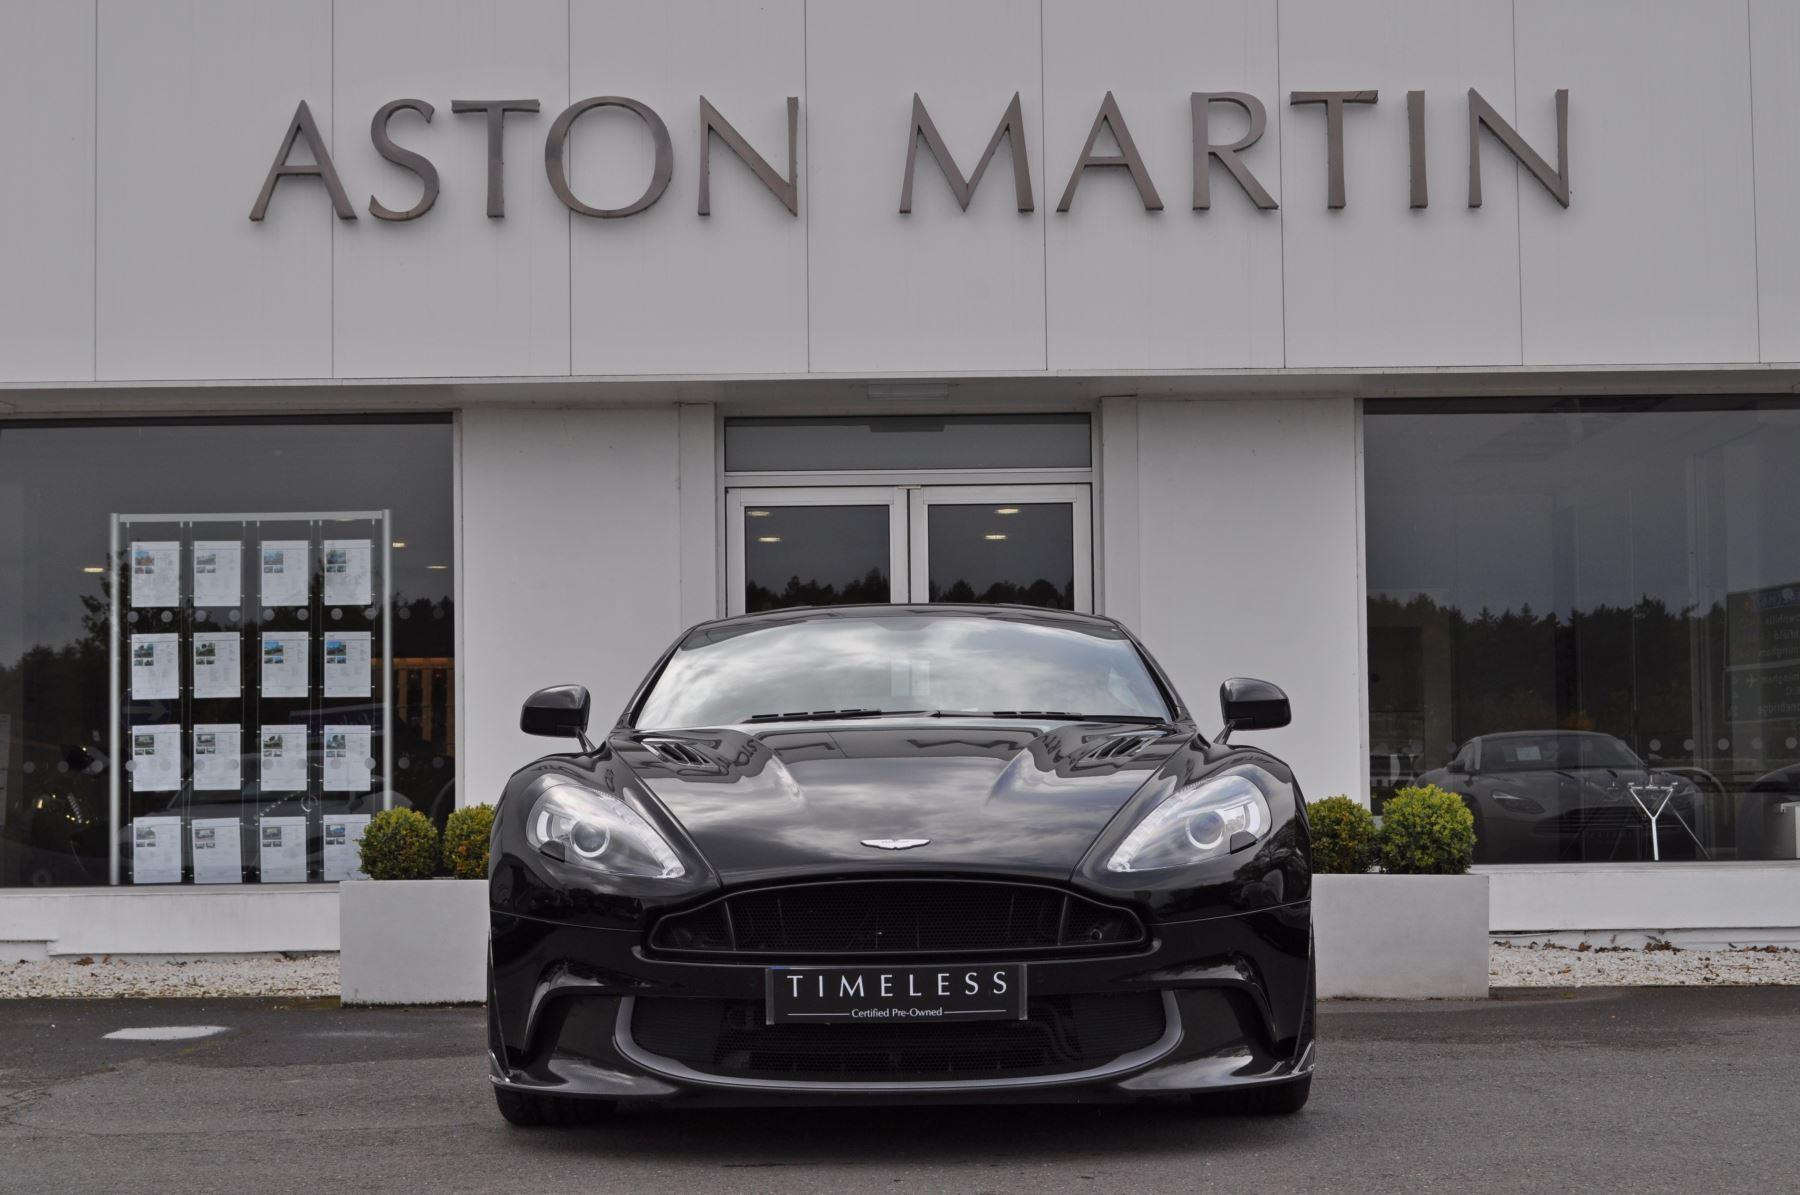 Aston Martin Vanquish S V12 [595] S 2+2 2dr Touchtronic image 2